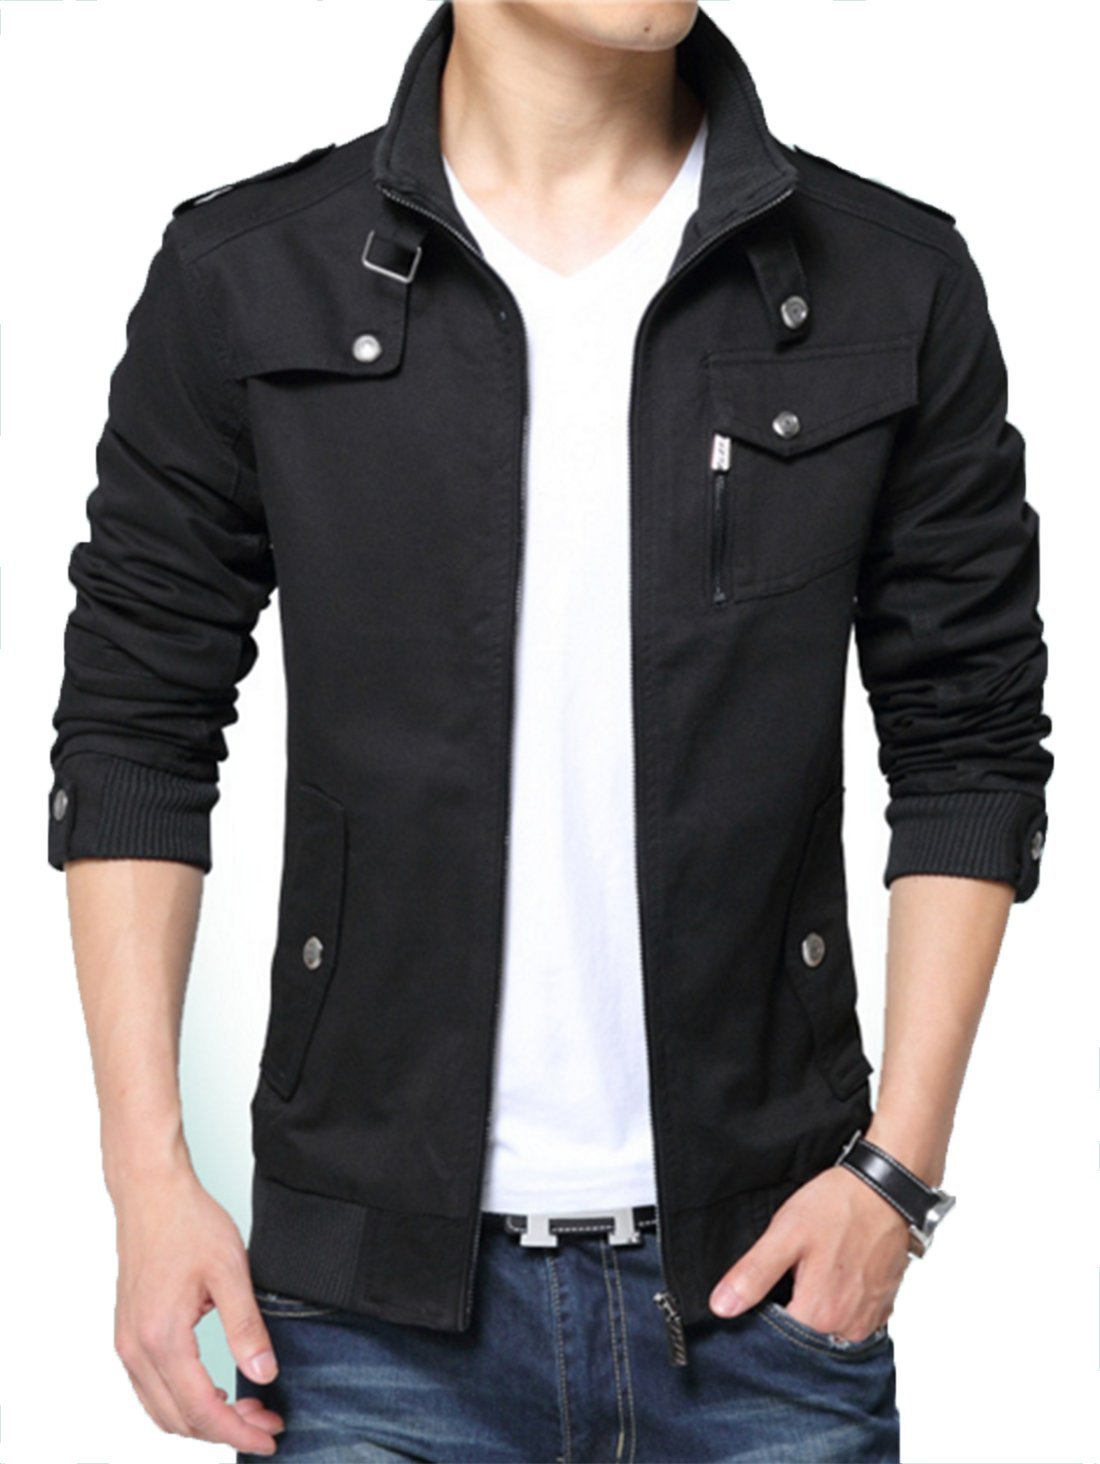 Kjdshwa Men's Long Sleeve Full Zip Lightweight Jacket(Black 888,M Size) by Kjdshwa